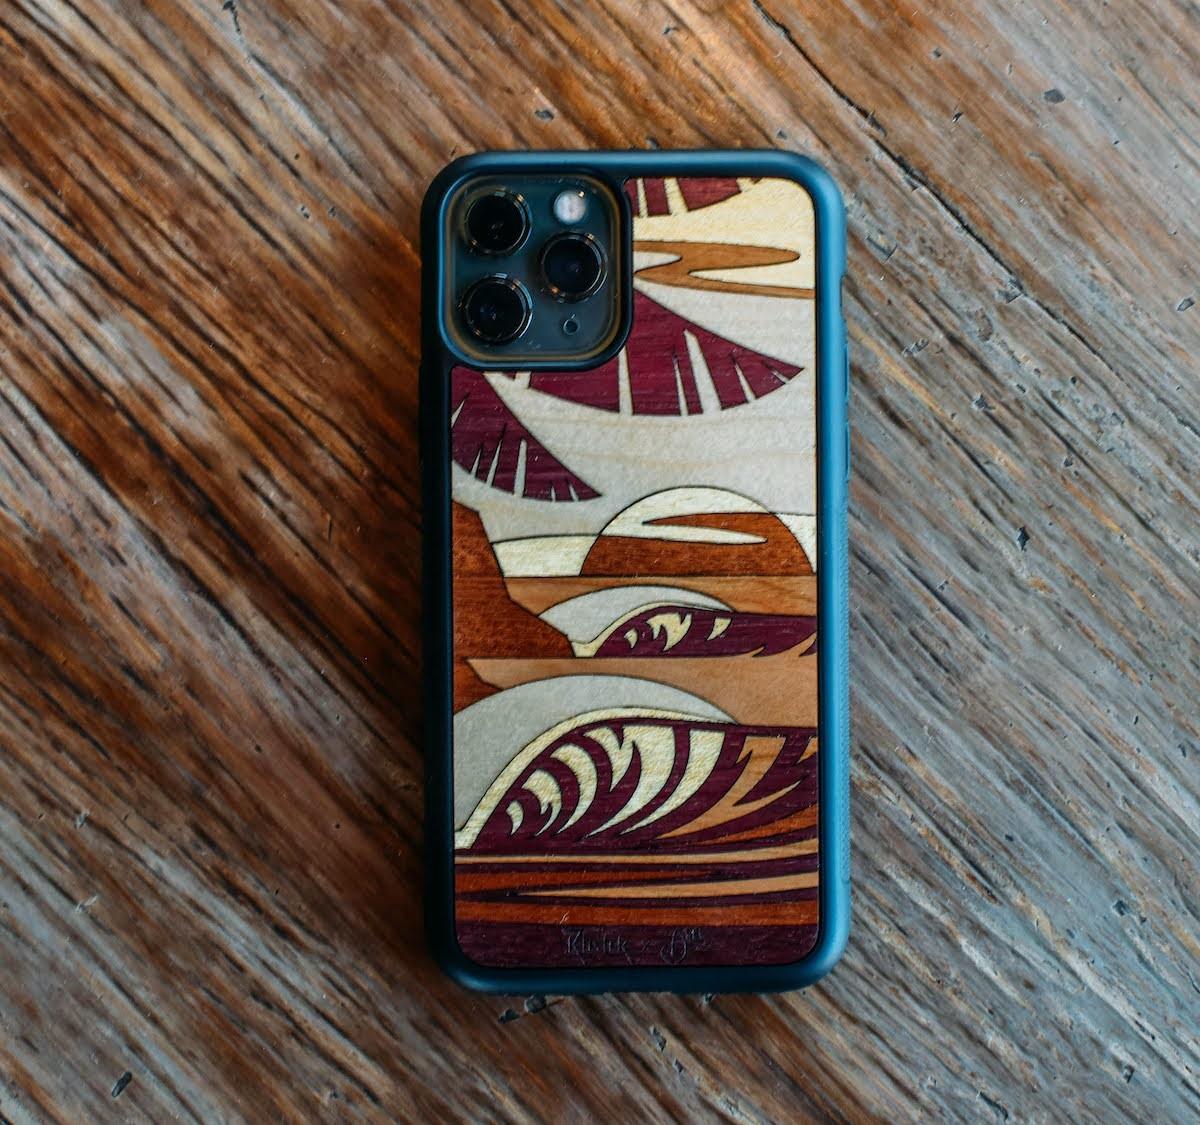 Rustek x Abel Arts Sun Sets West Inlay wood iPhone 12 case depicts a coastal landscape